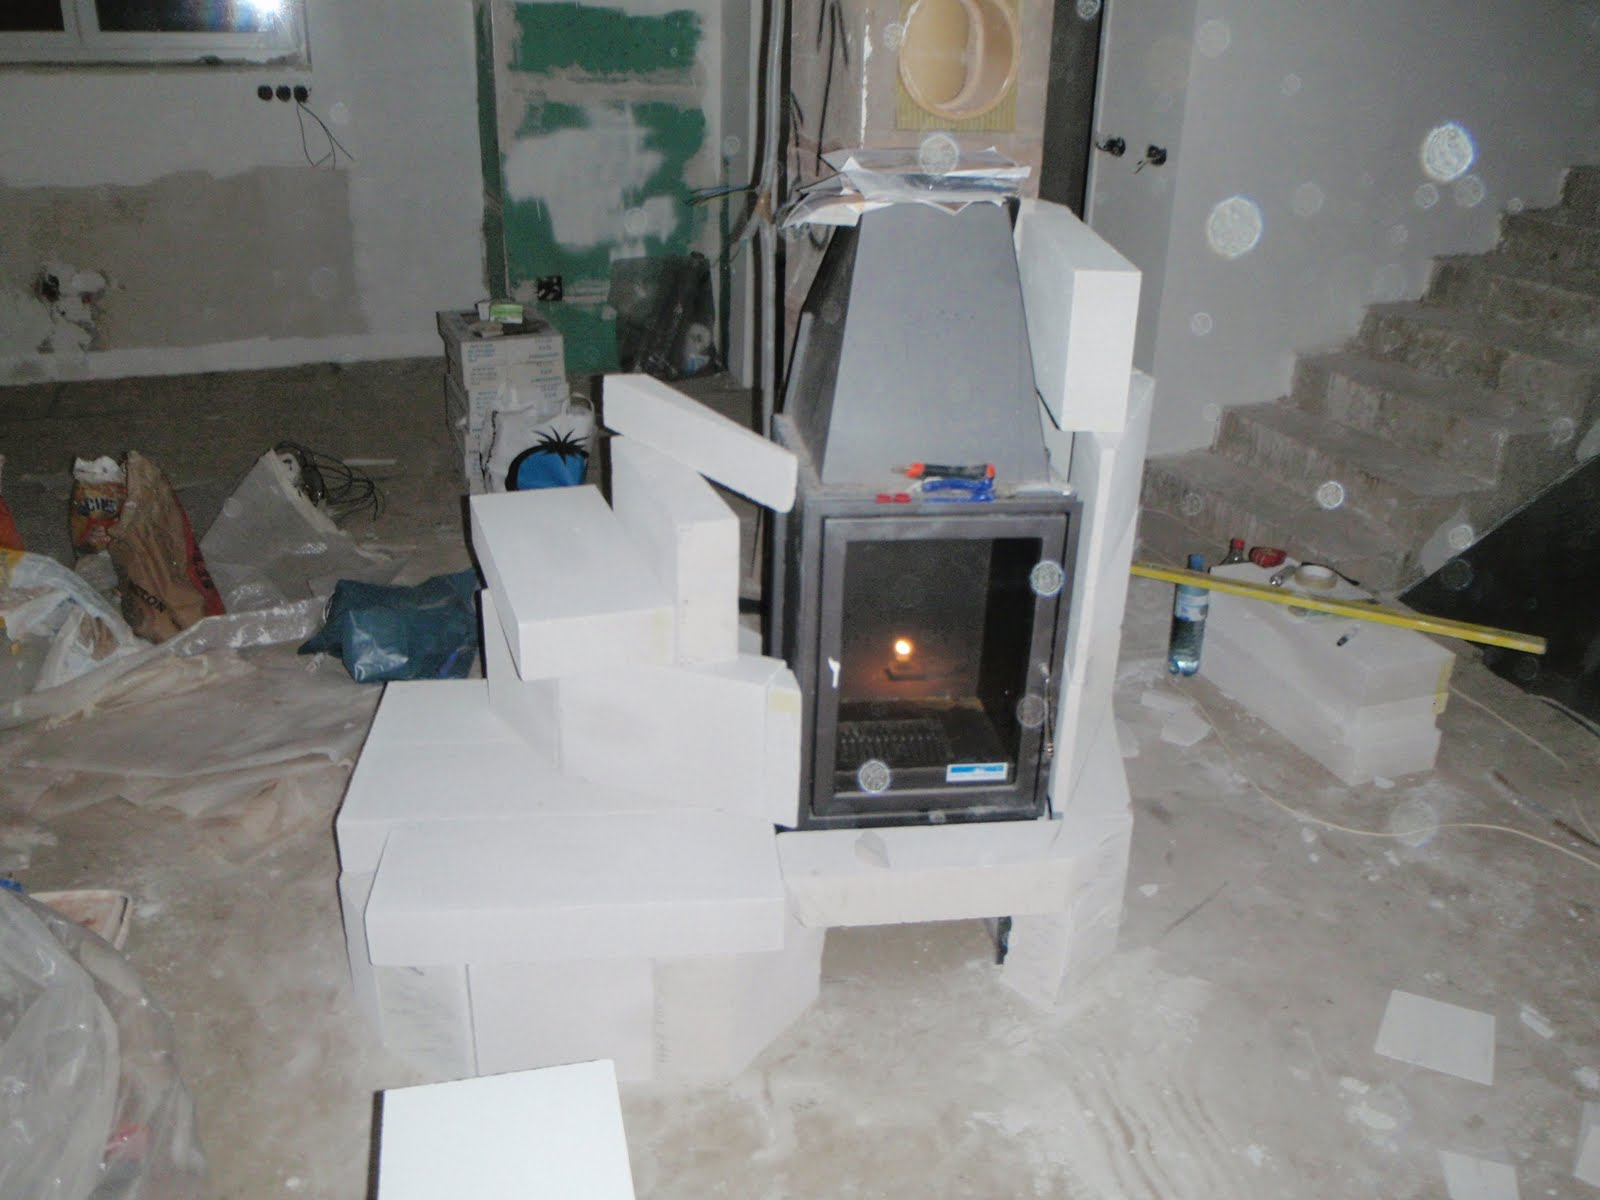 zieglers bauen haus november 2010. Black Bedroom Furniture Sets. Home Design Ideas